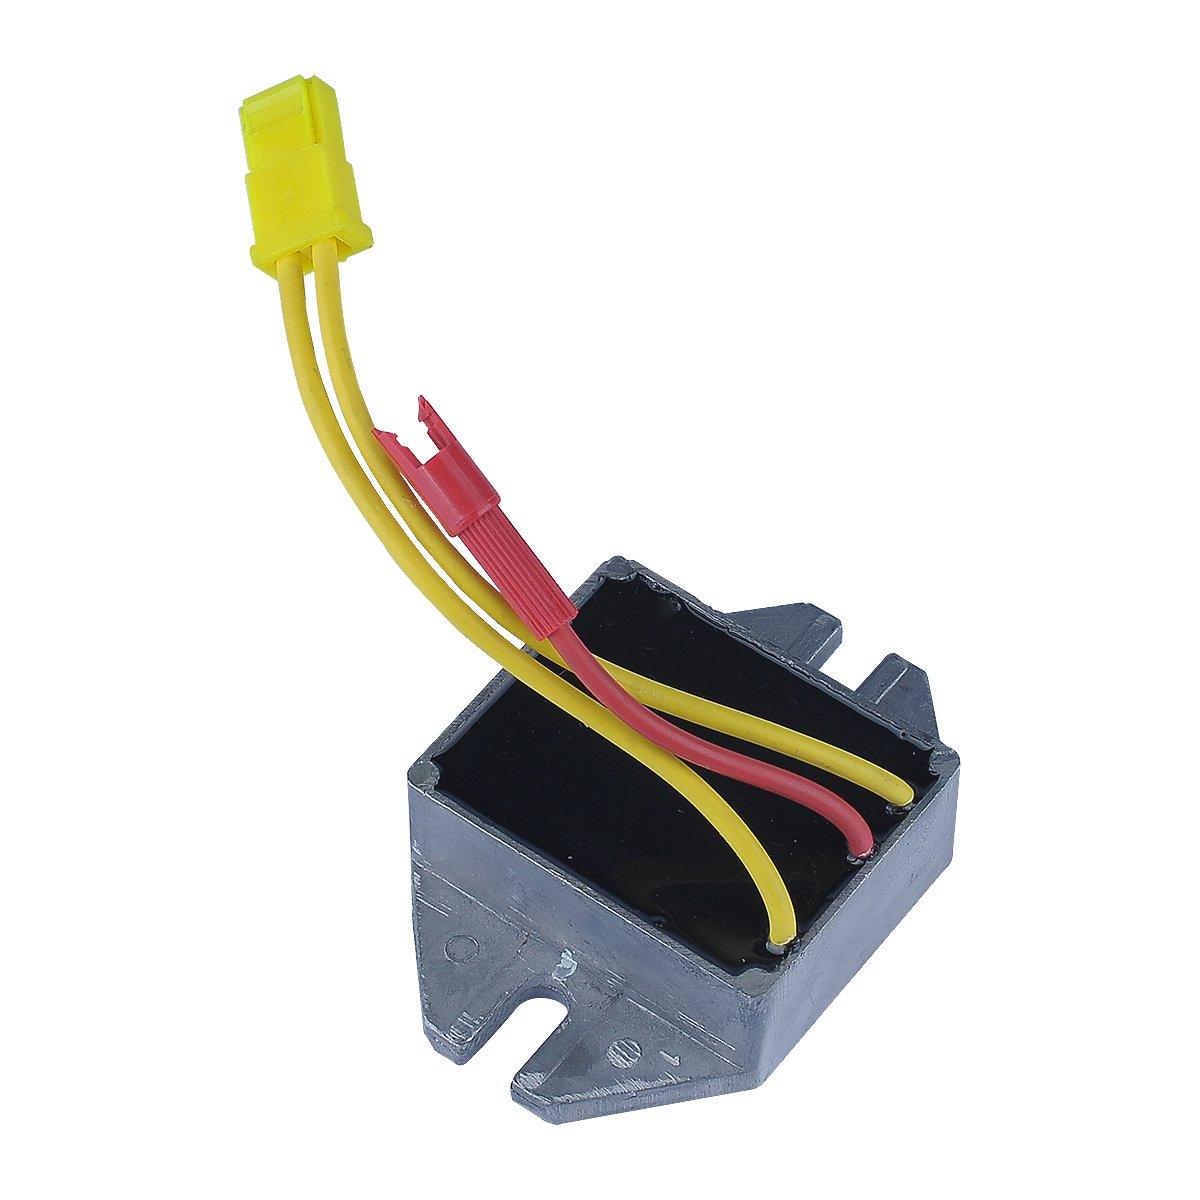 HIPA Electrical Voltage Regulator 845907 394890 797375 393374 691185 for Briggs & Stratton 192400 196400 226400 280700 351700 28M700 Engine